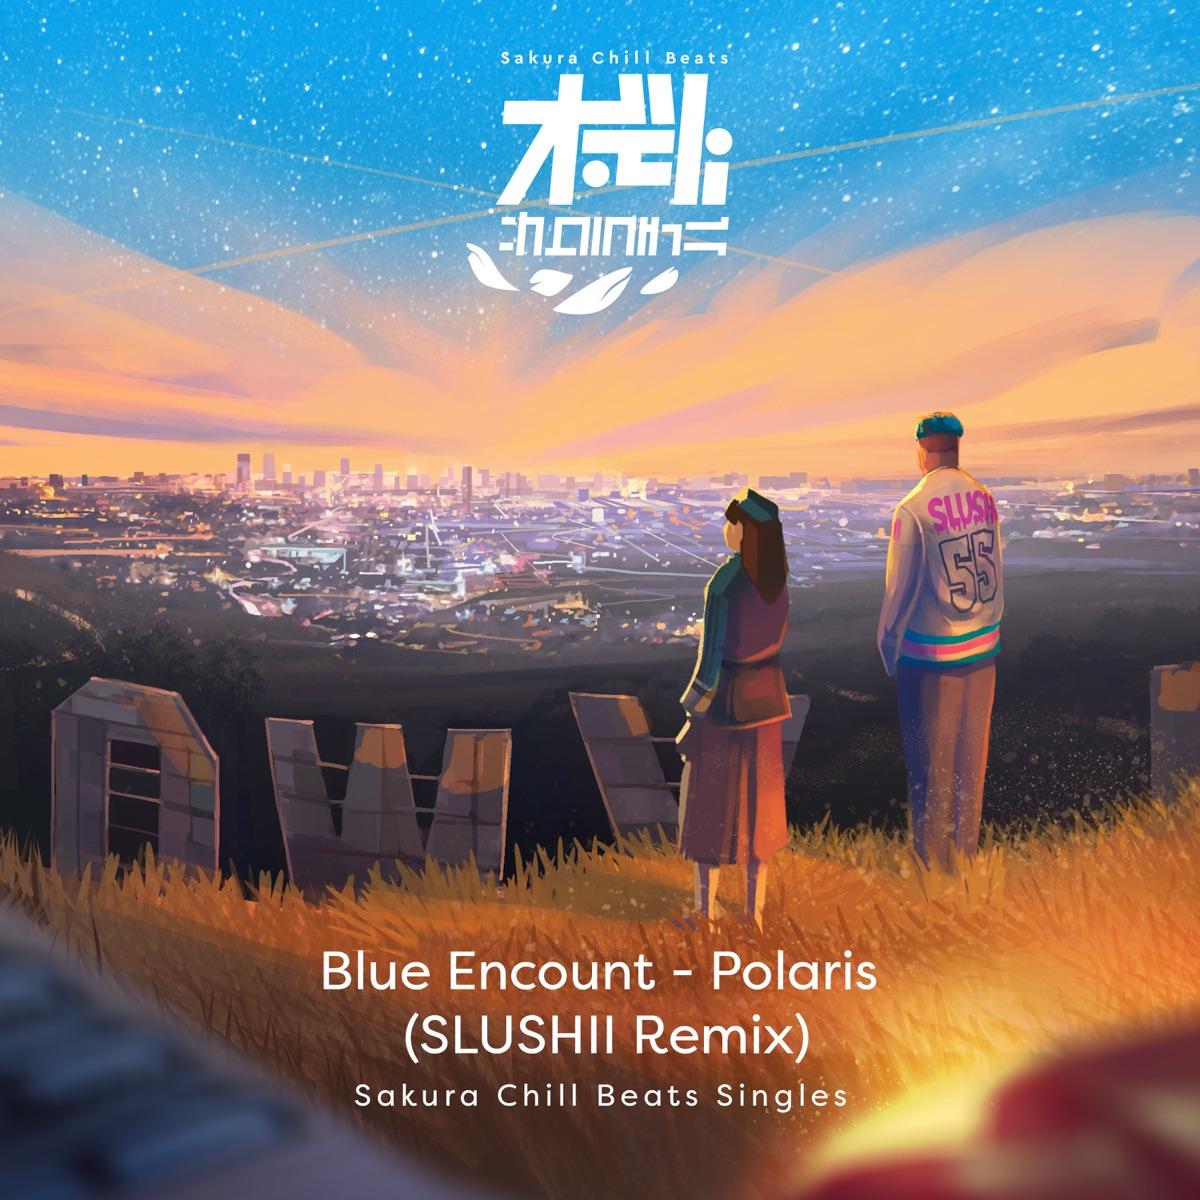 BLUE ENCOUNT   Polaris Slushii Remix Lyrics + English ...